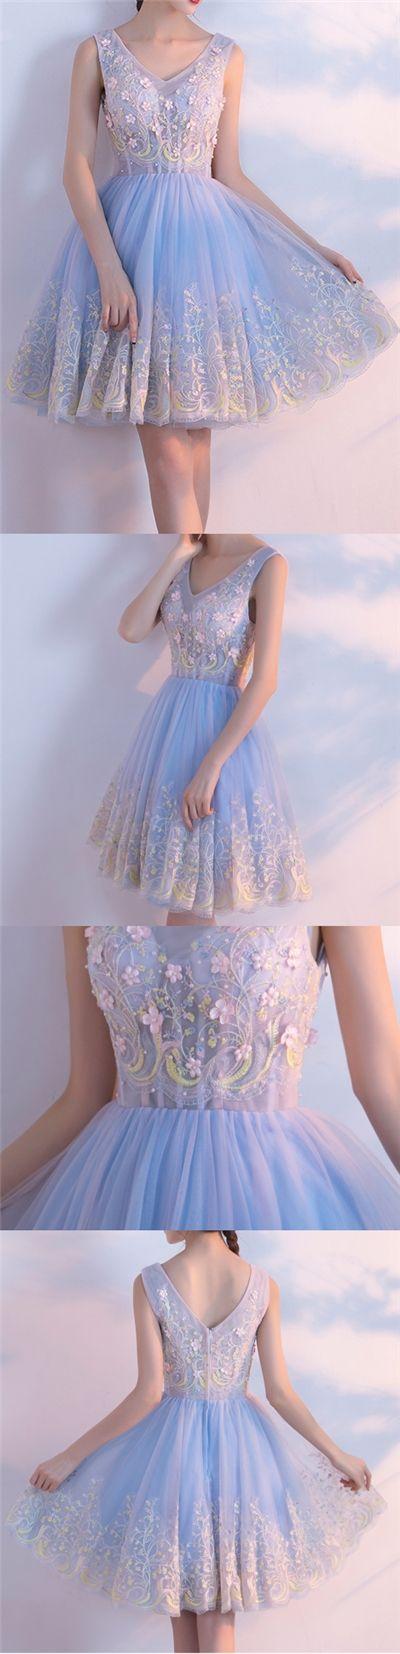 Beautiful Homecoming Dress V-neck Appliques Tulle Short Prom Dress Party Dress JK304